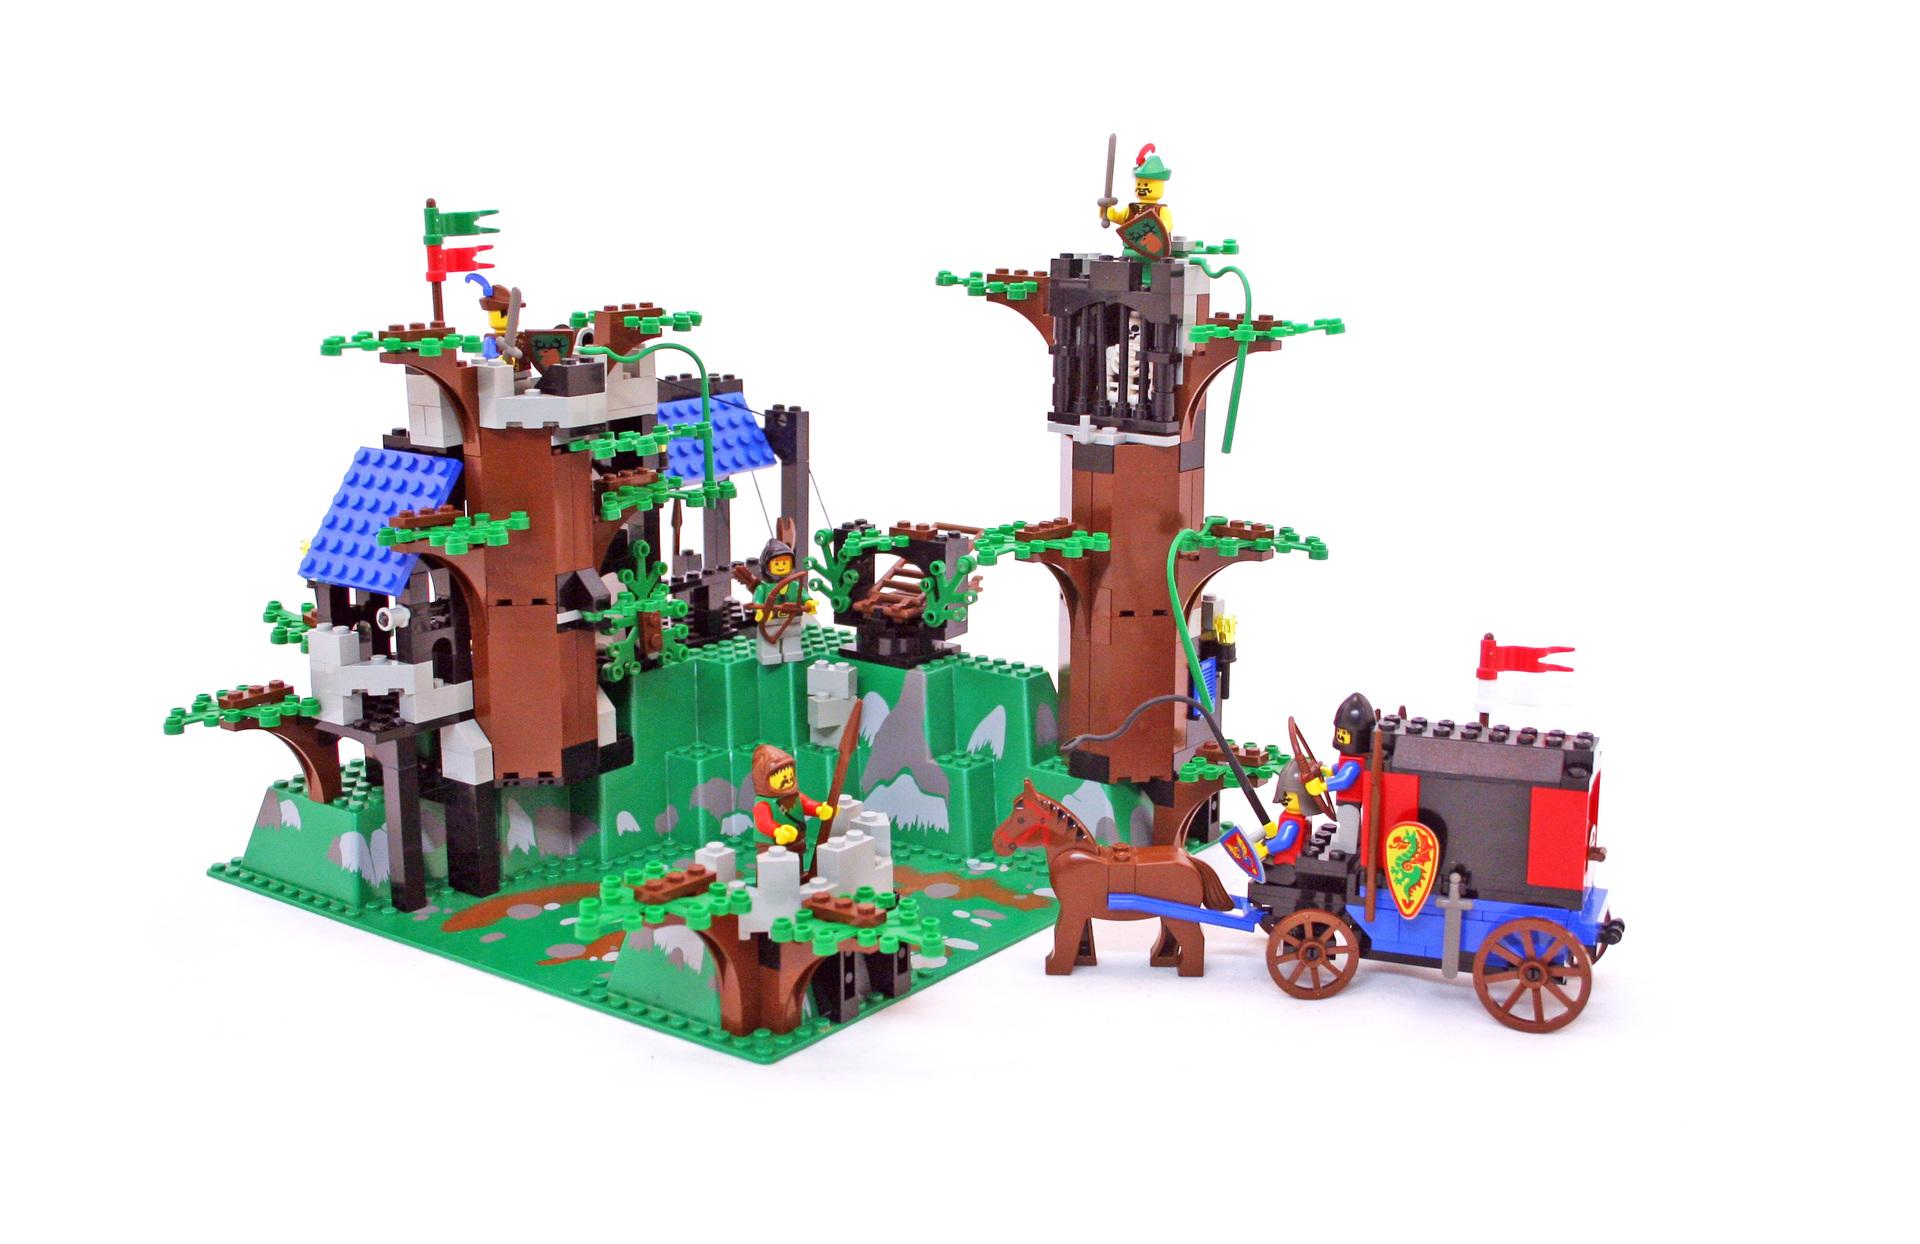 Lego castle castle oldbrown wall ref 2345//set dark forest fortress 6097 6020